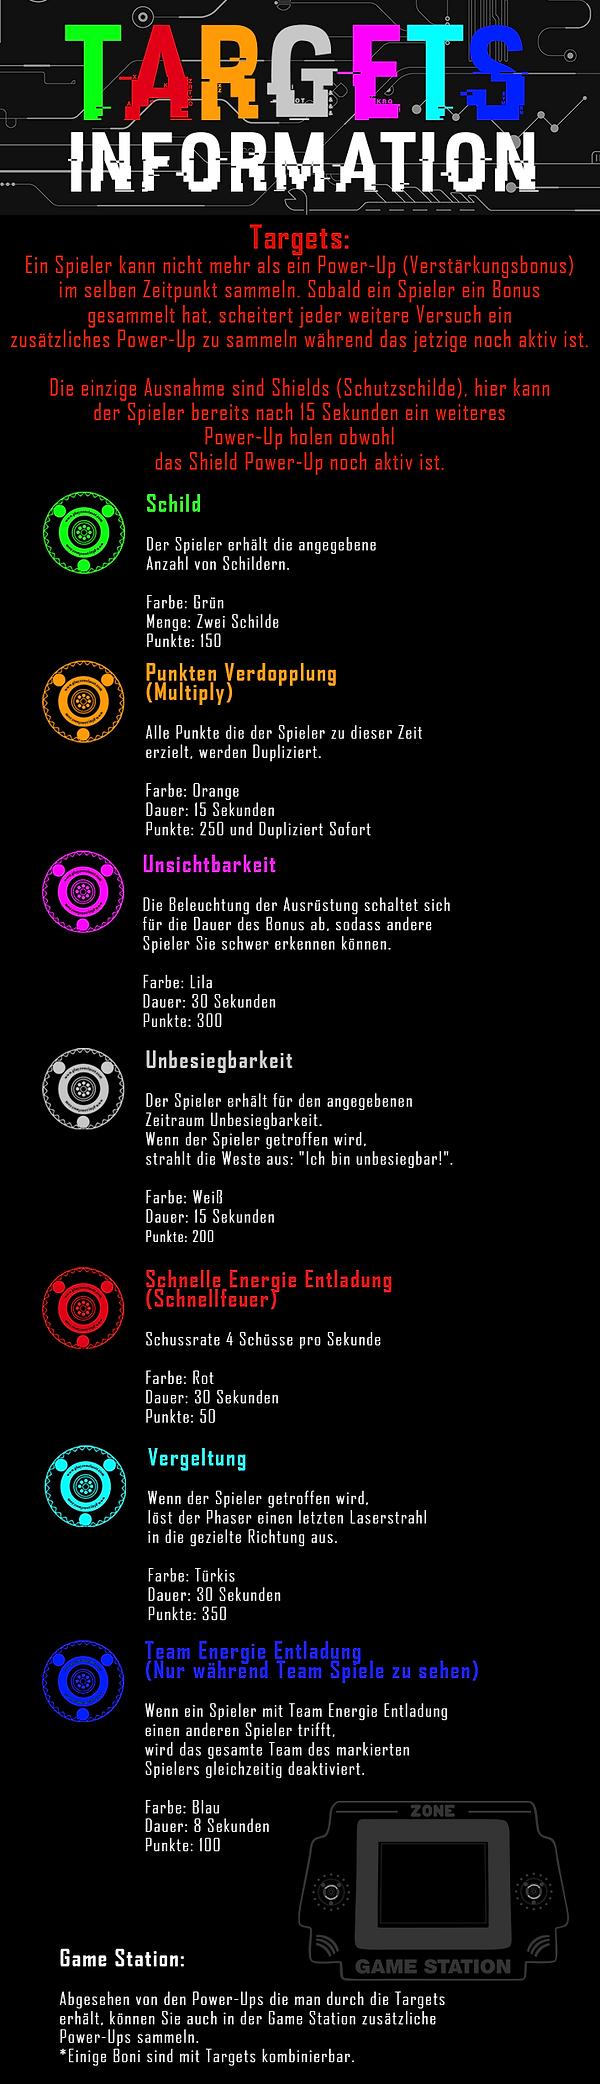 Ingolstadt Lasertag Info Mobile